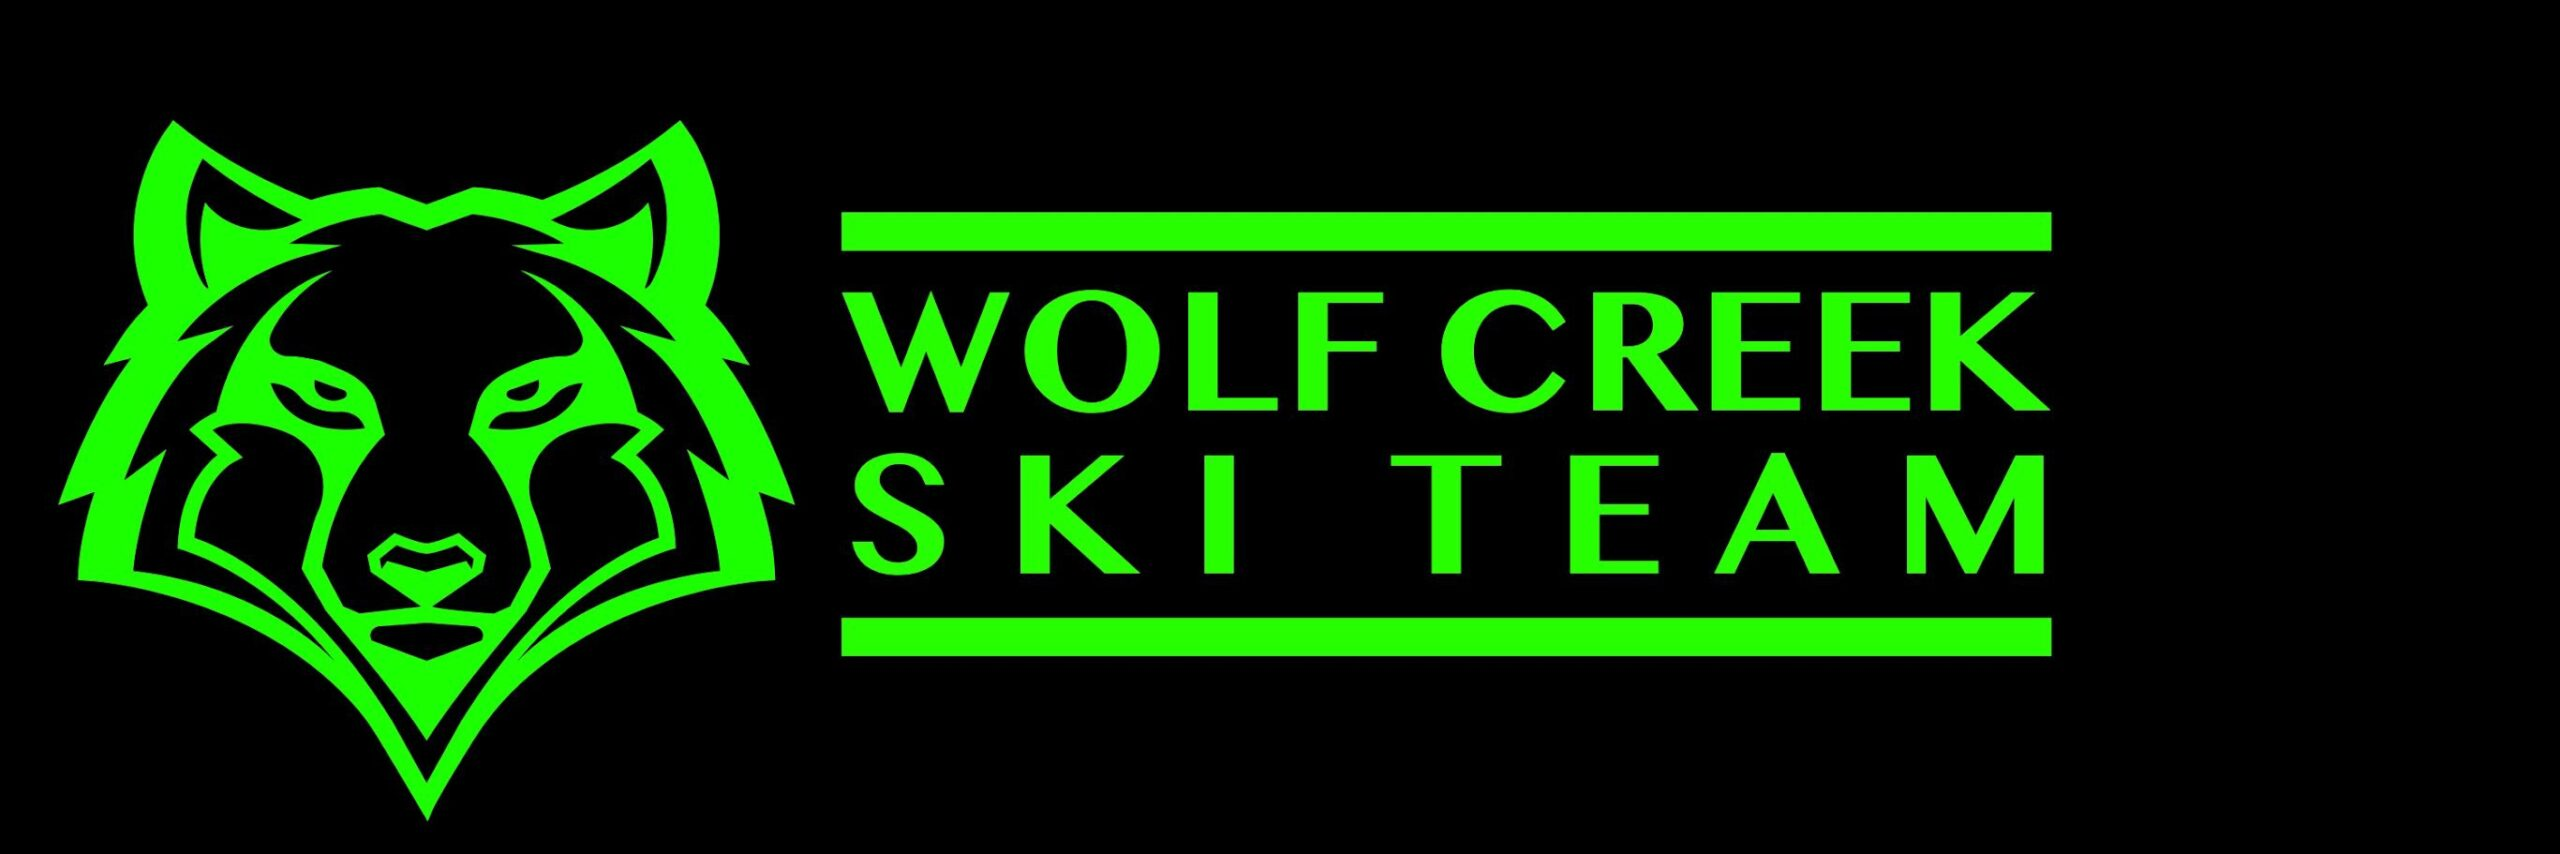 Wolf Creek Ski Team